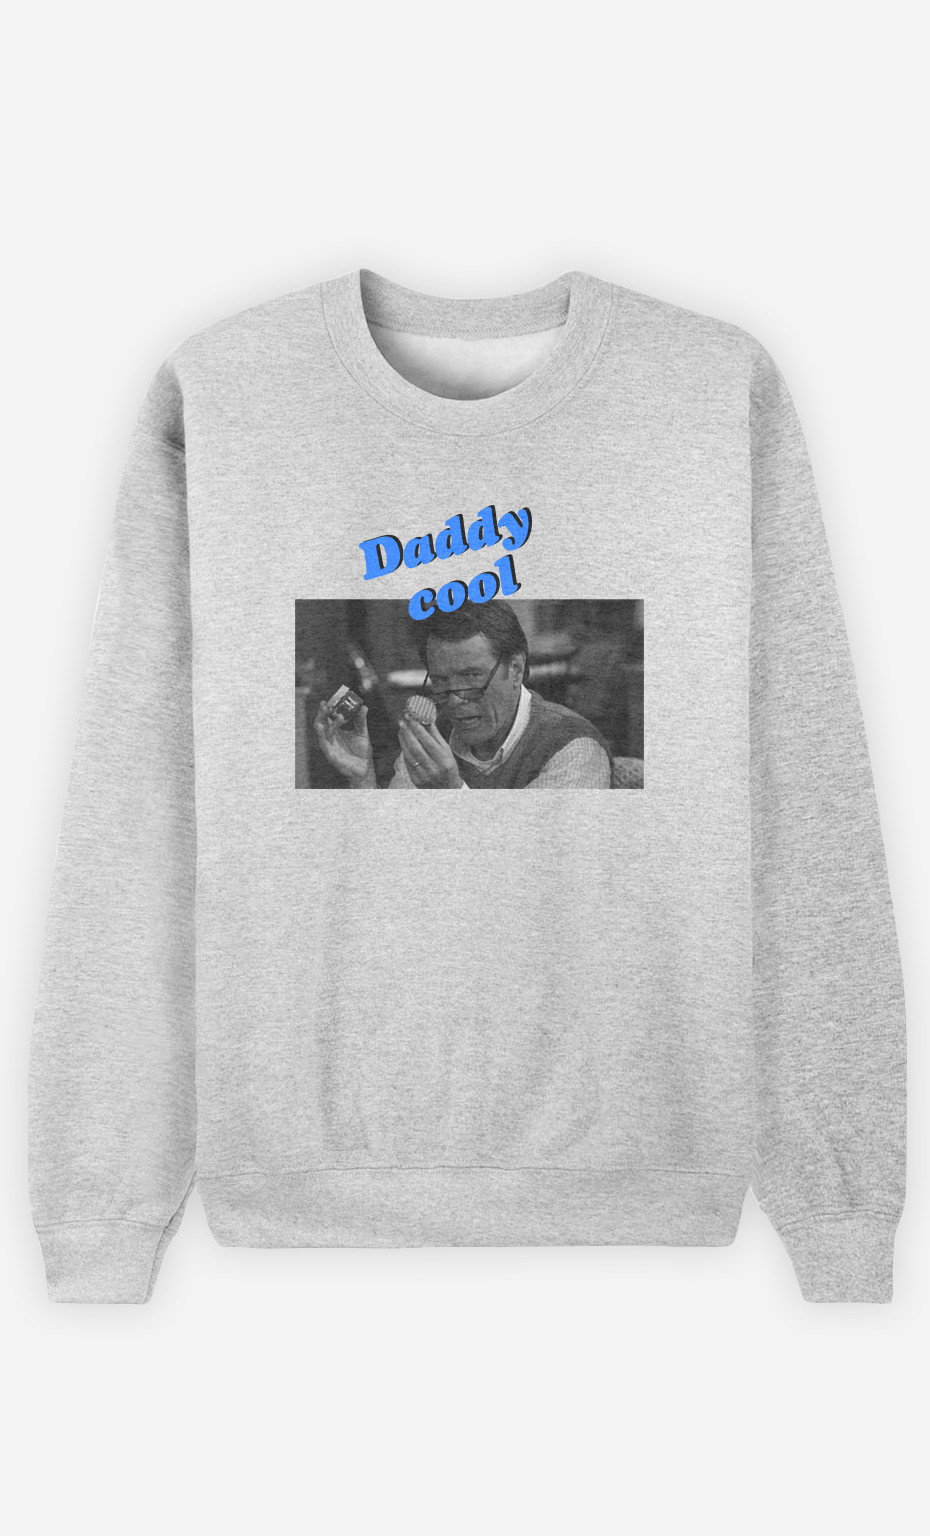 Sweatshirt Daddy Cool